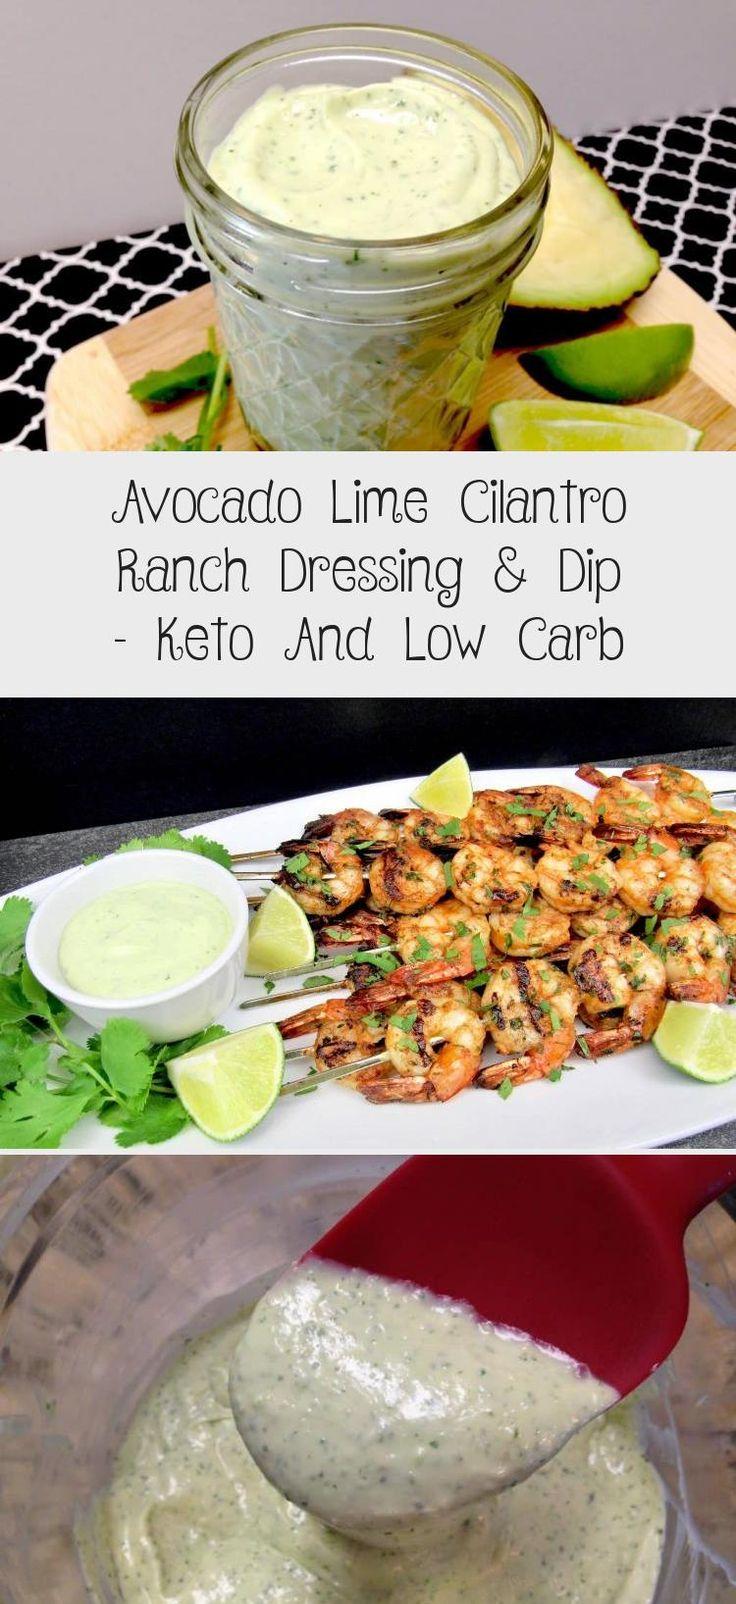 Avocado lime cilantro ranch dressing dip keto and low